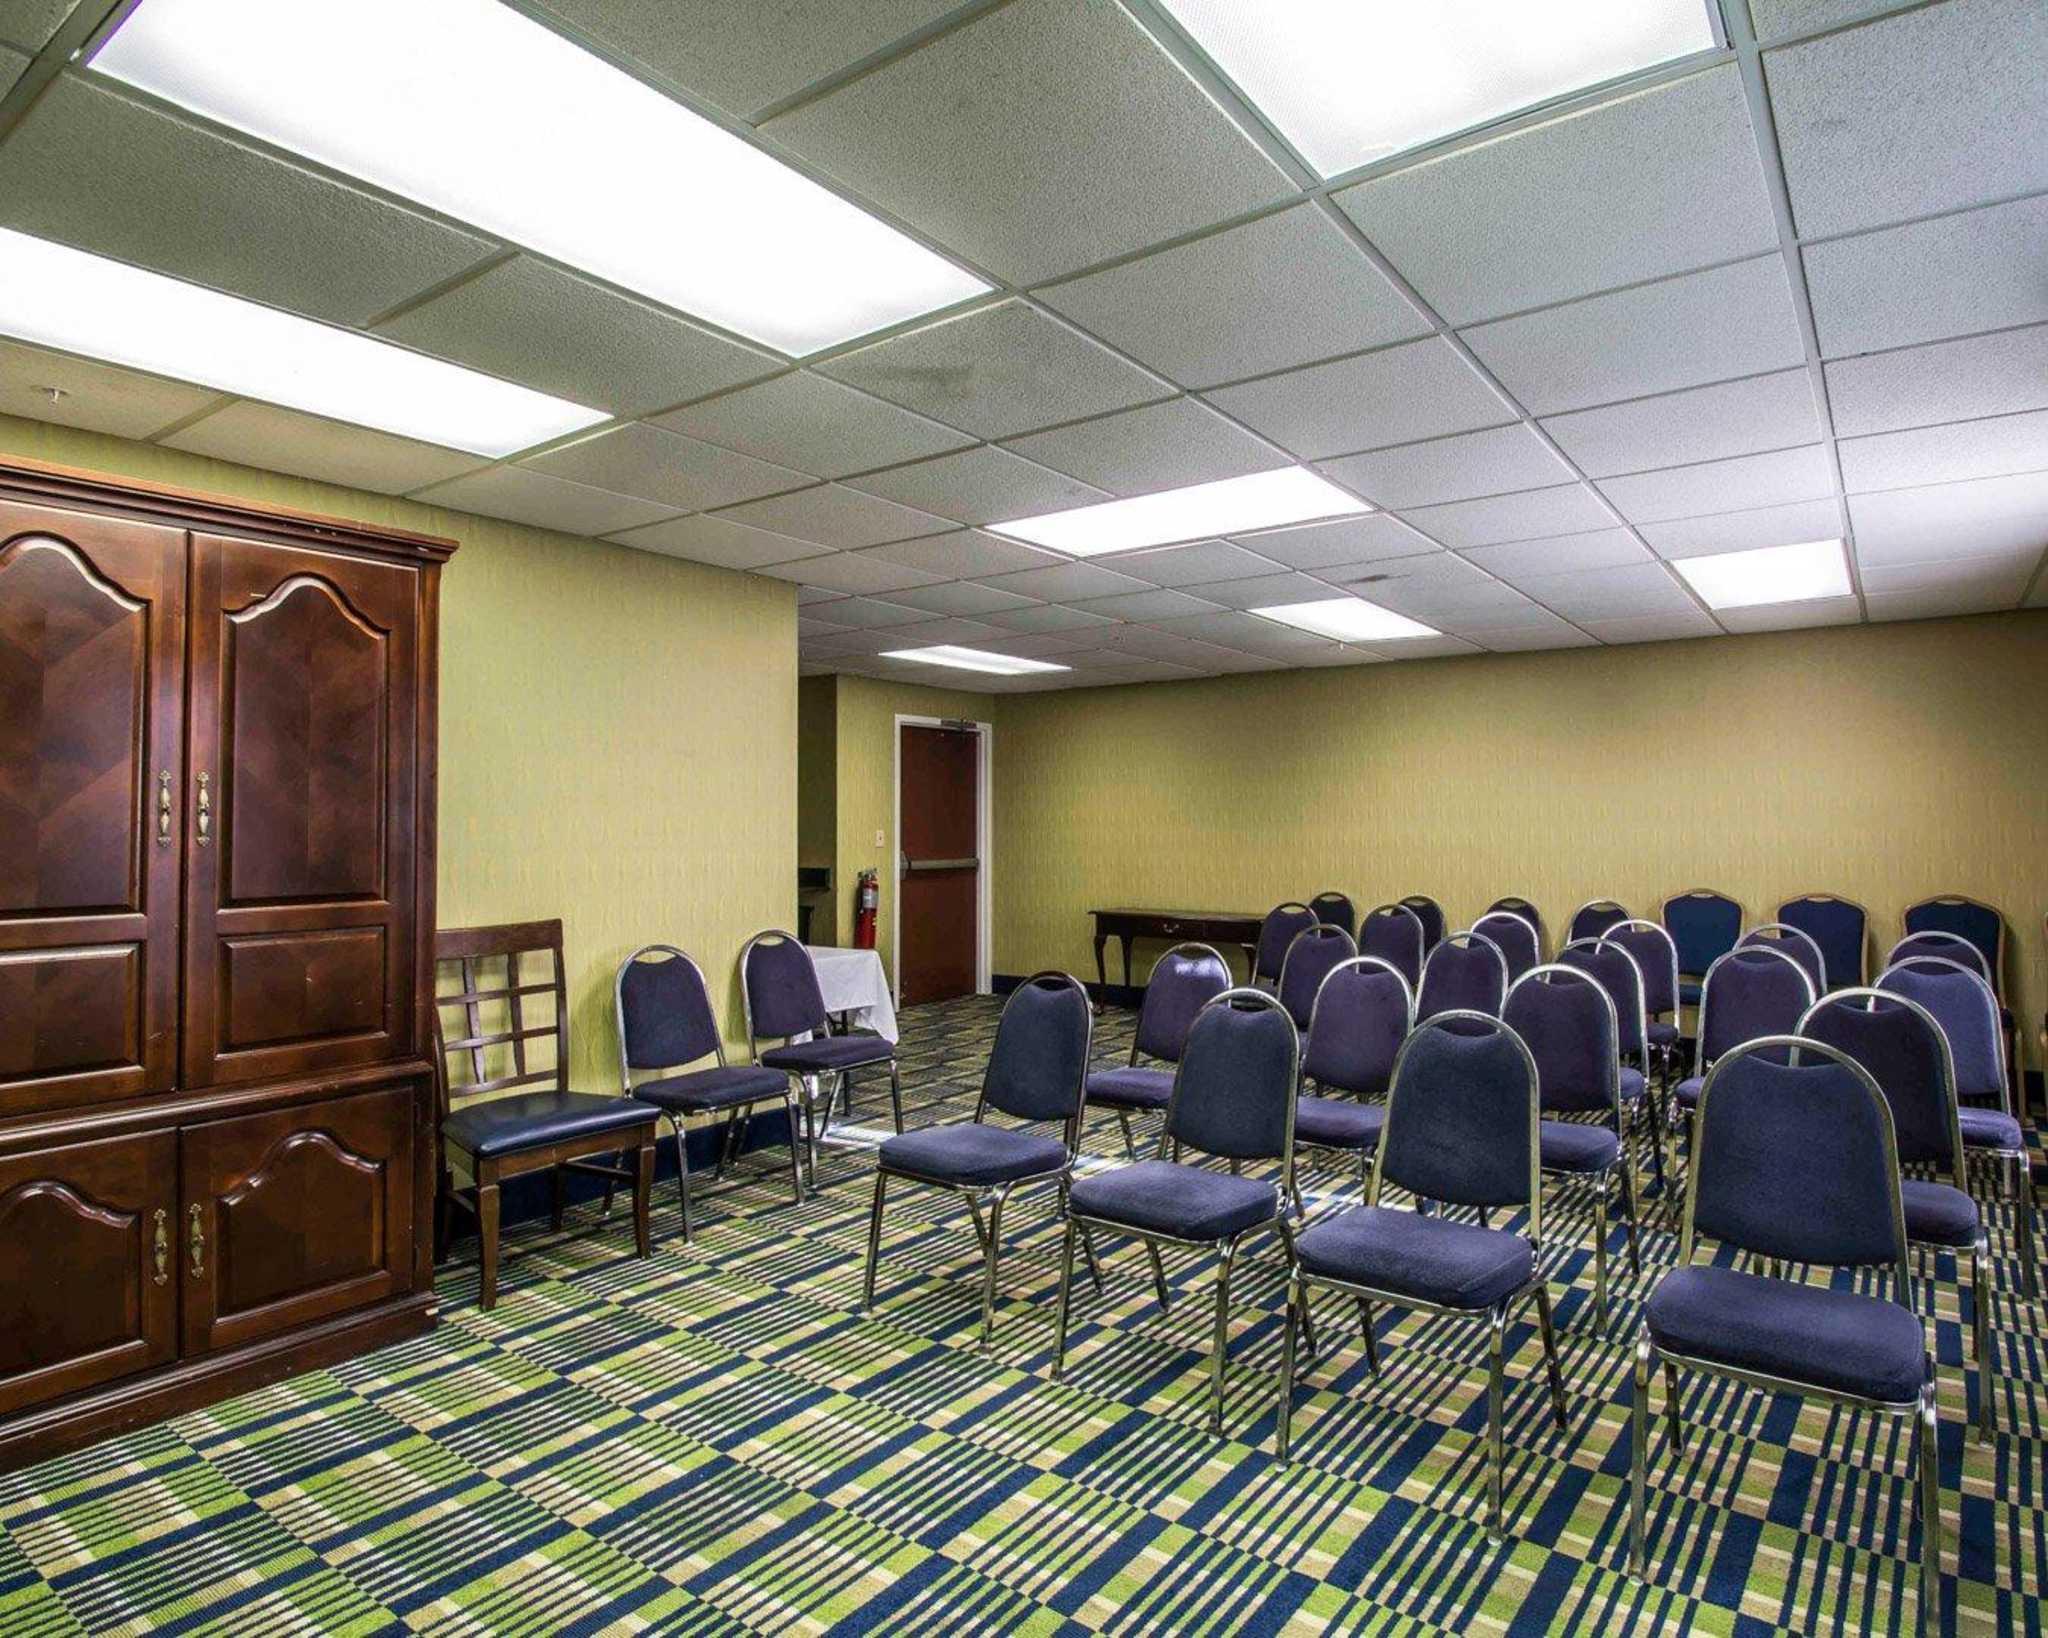 Comfort Inn & Suites Lantana - West Palm Beach South image 15